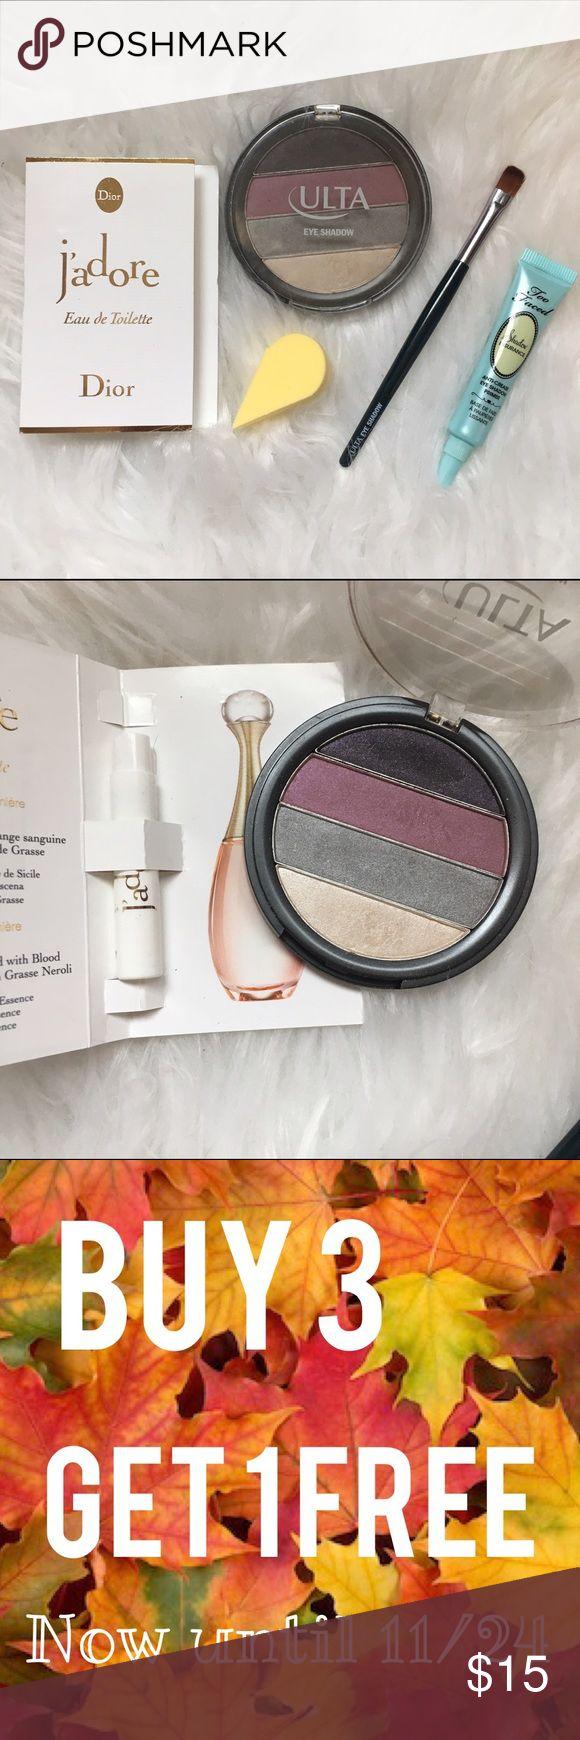 Eyeshadow Dior Bundle Includes: mini Dior perfume, an eyeshadow brush, yellow blender, travel size Too Faced eyeshadow primer & ulta eyeshadow palette swatched with professional makeup brush. No trades. Price is firm unless bundled. 🇺🇸30% off Bundles 🇺🇸 Sephora Makeup Eyeshadow